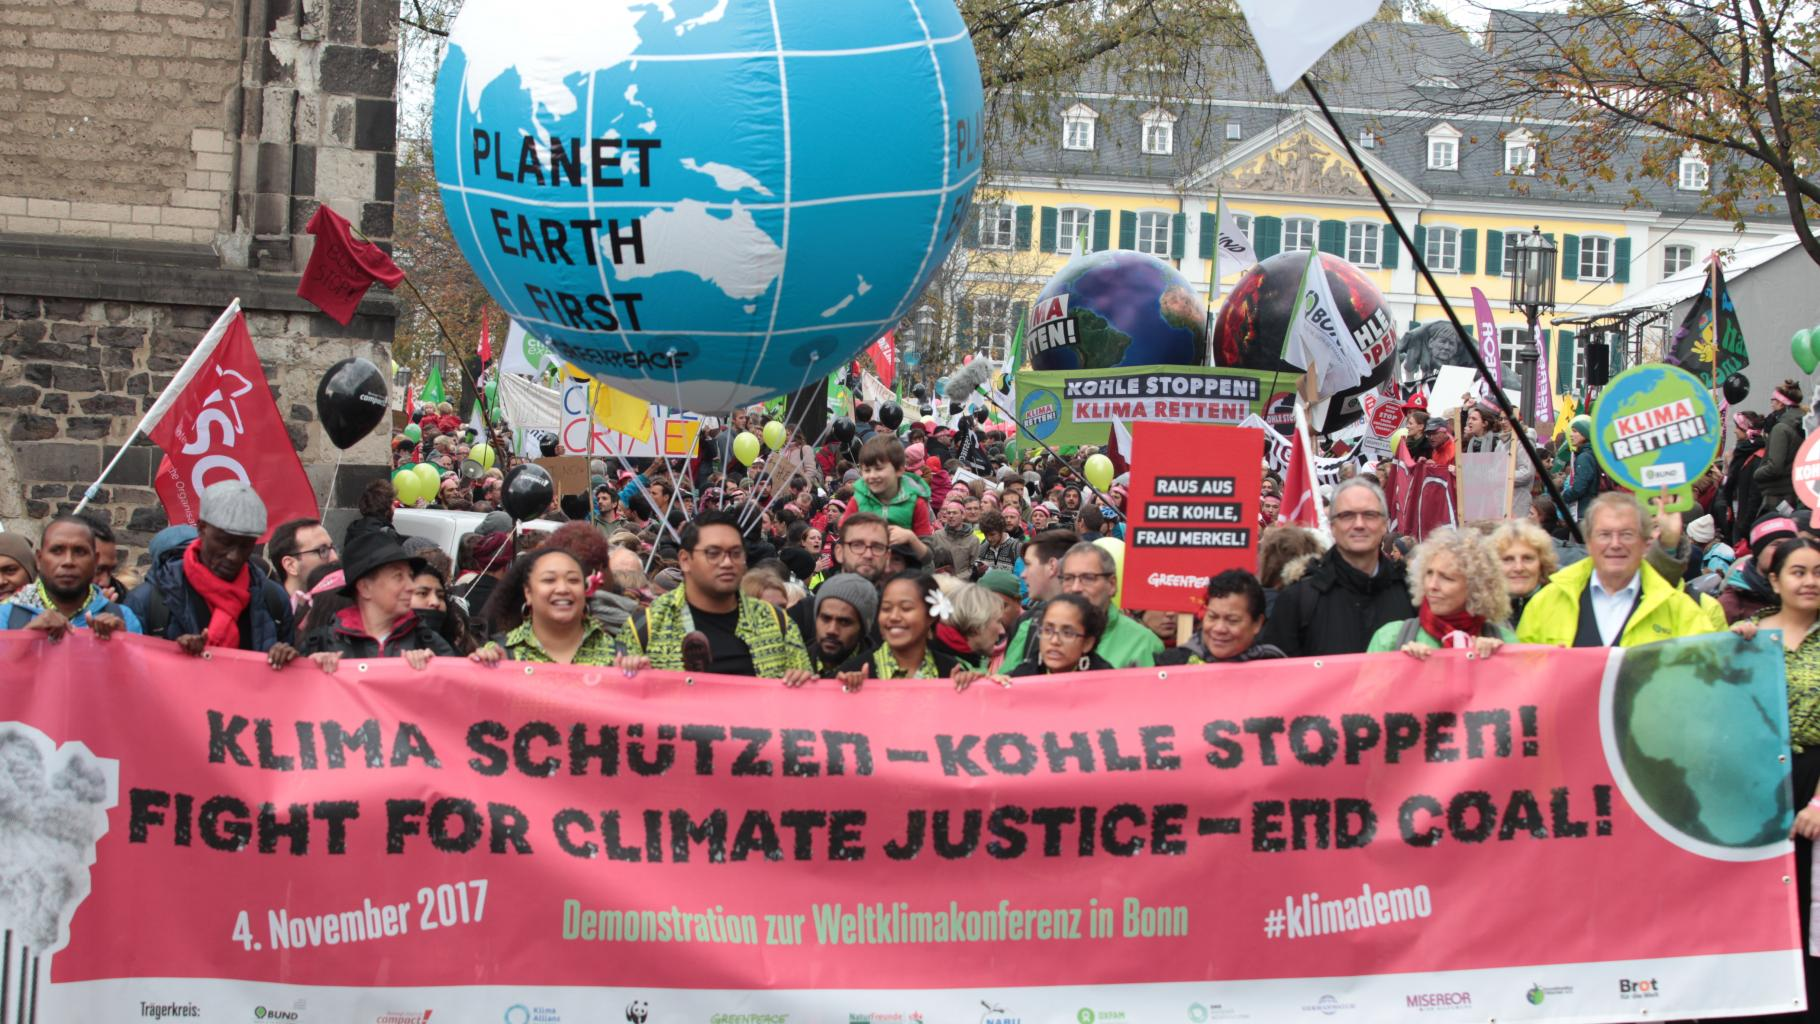 Demonstration zur Weltklimakonferenz in Bonn - Klima schützen - Kohle stoppen!